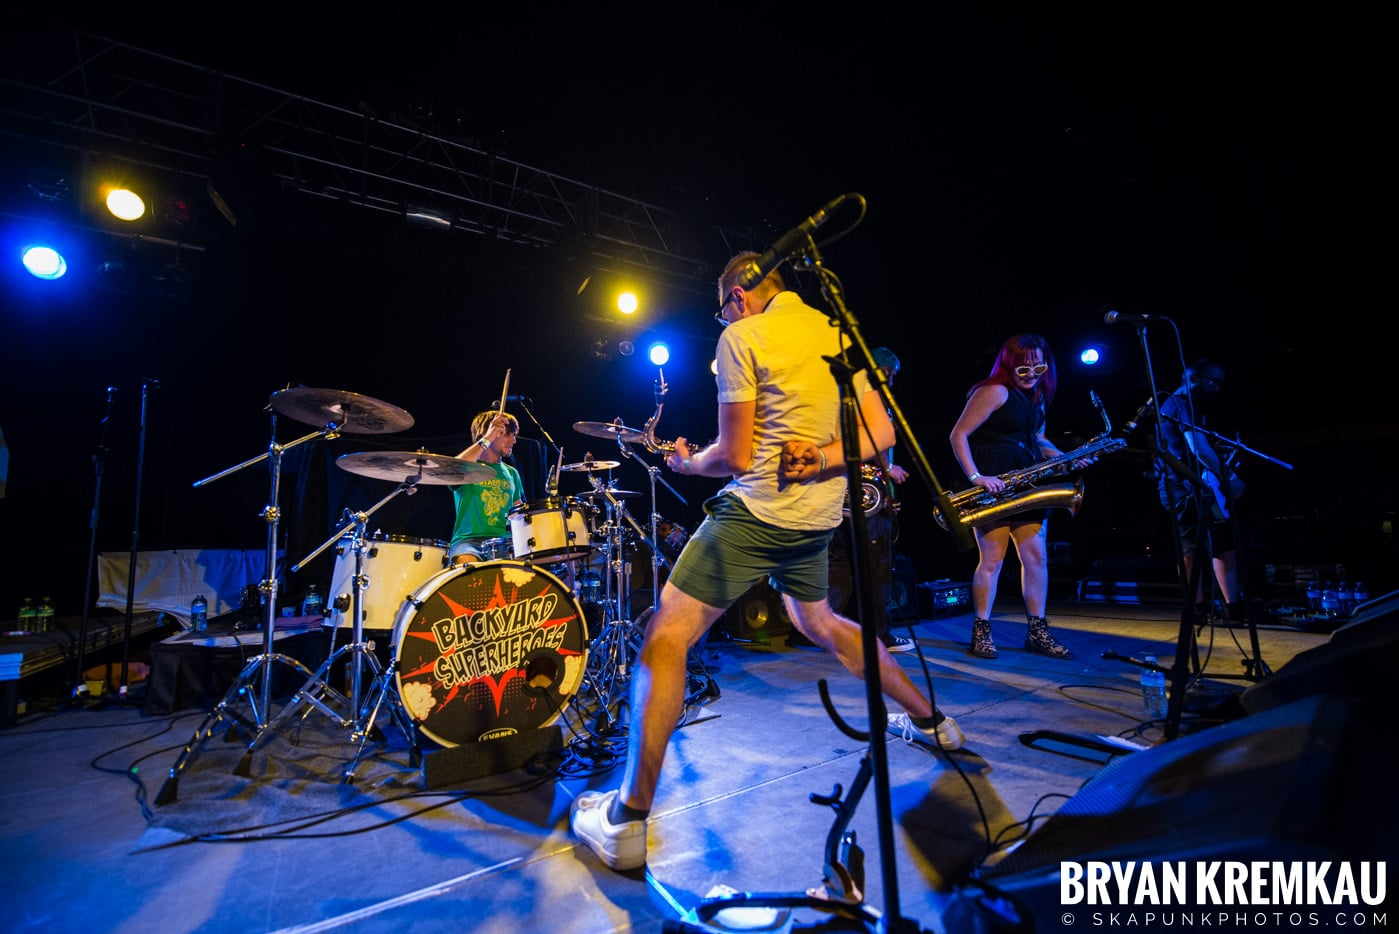 Backyard Superheroes @ Starland Ballroom, Sayreville, NJ - 7.29.17 (16)